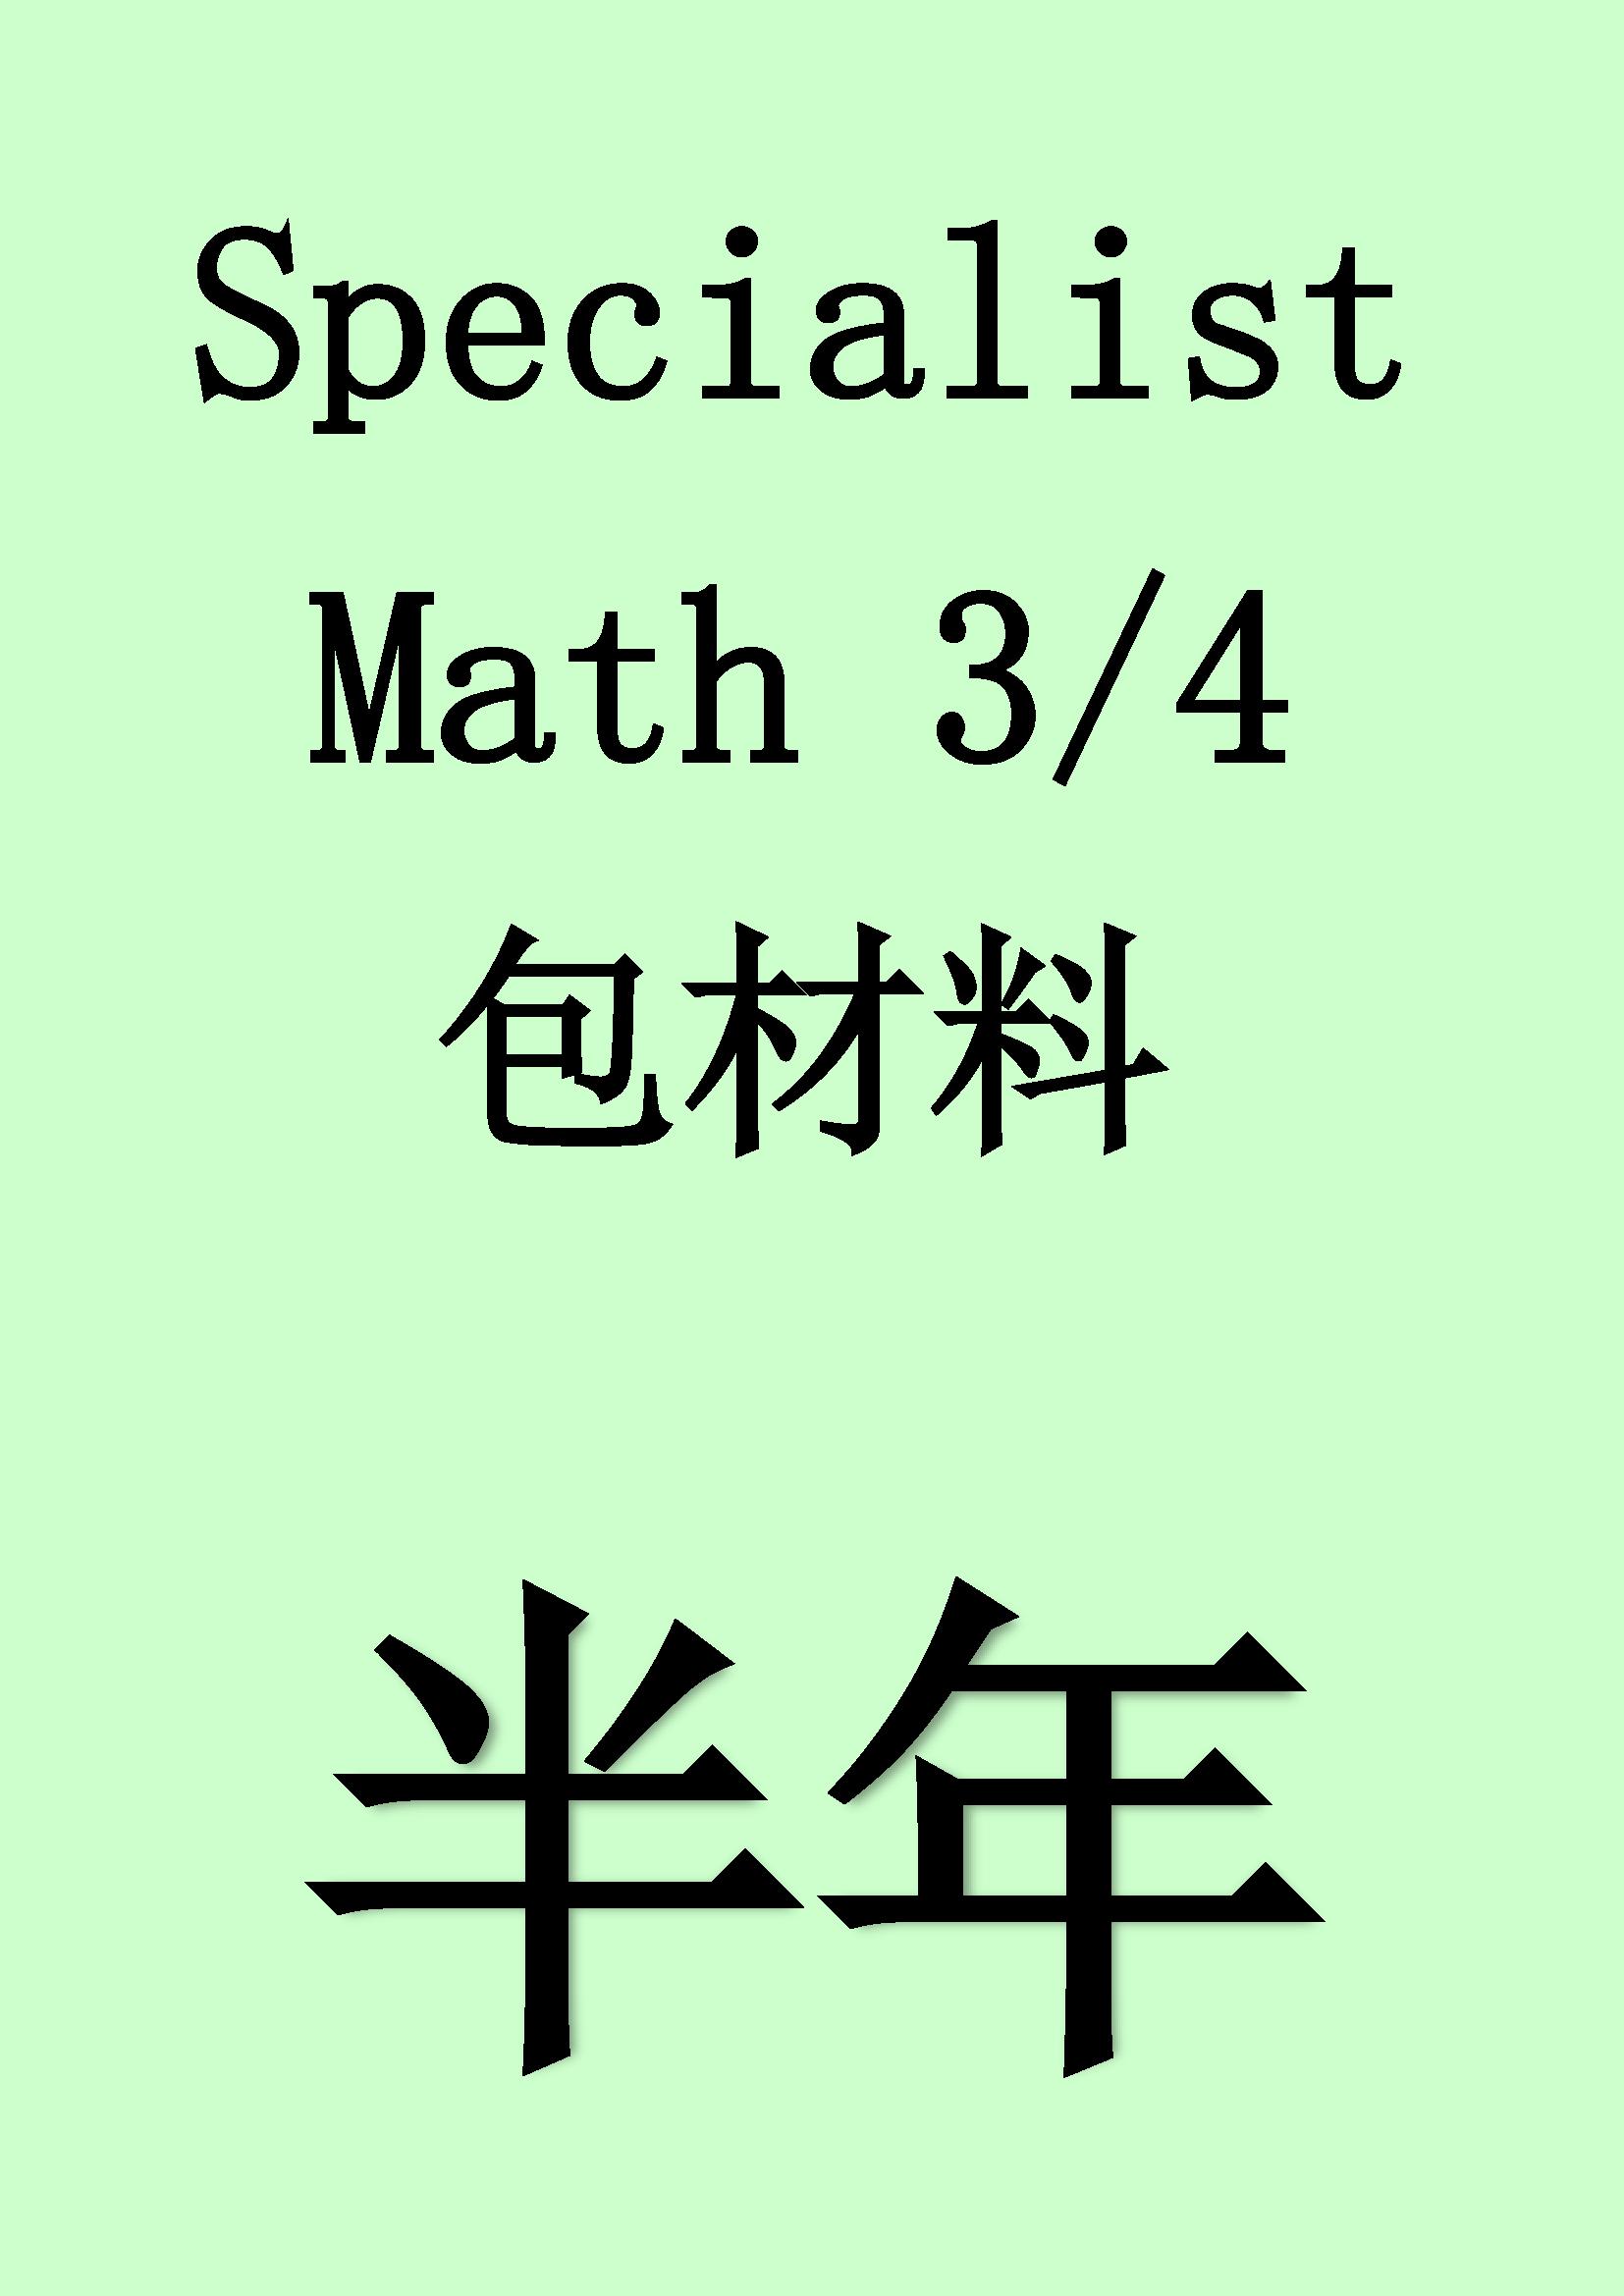 Specialist Math Unit 3/4 Half year - Sat Afternoon